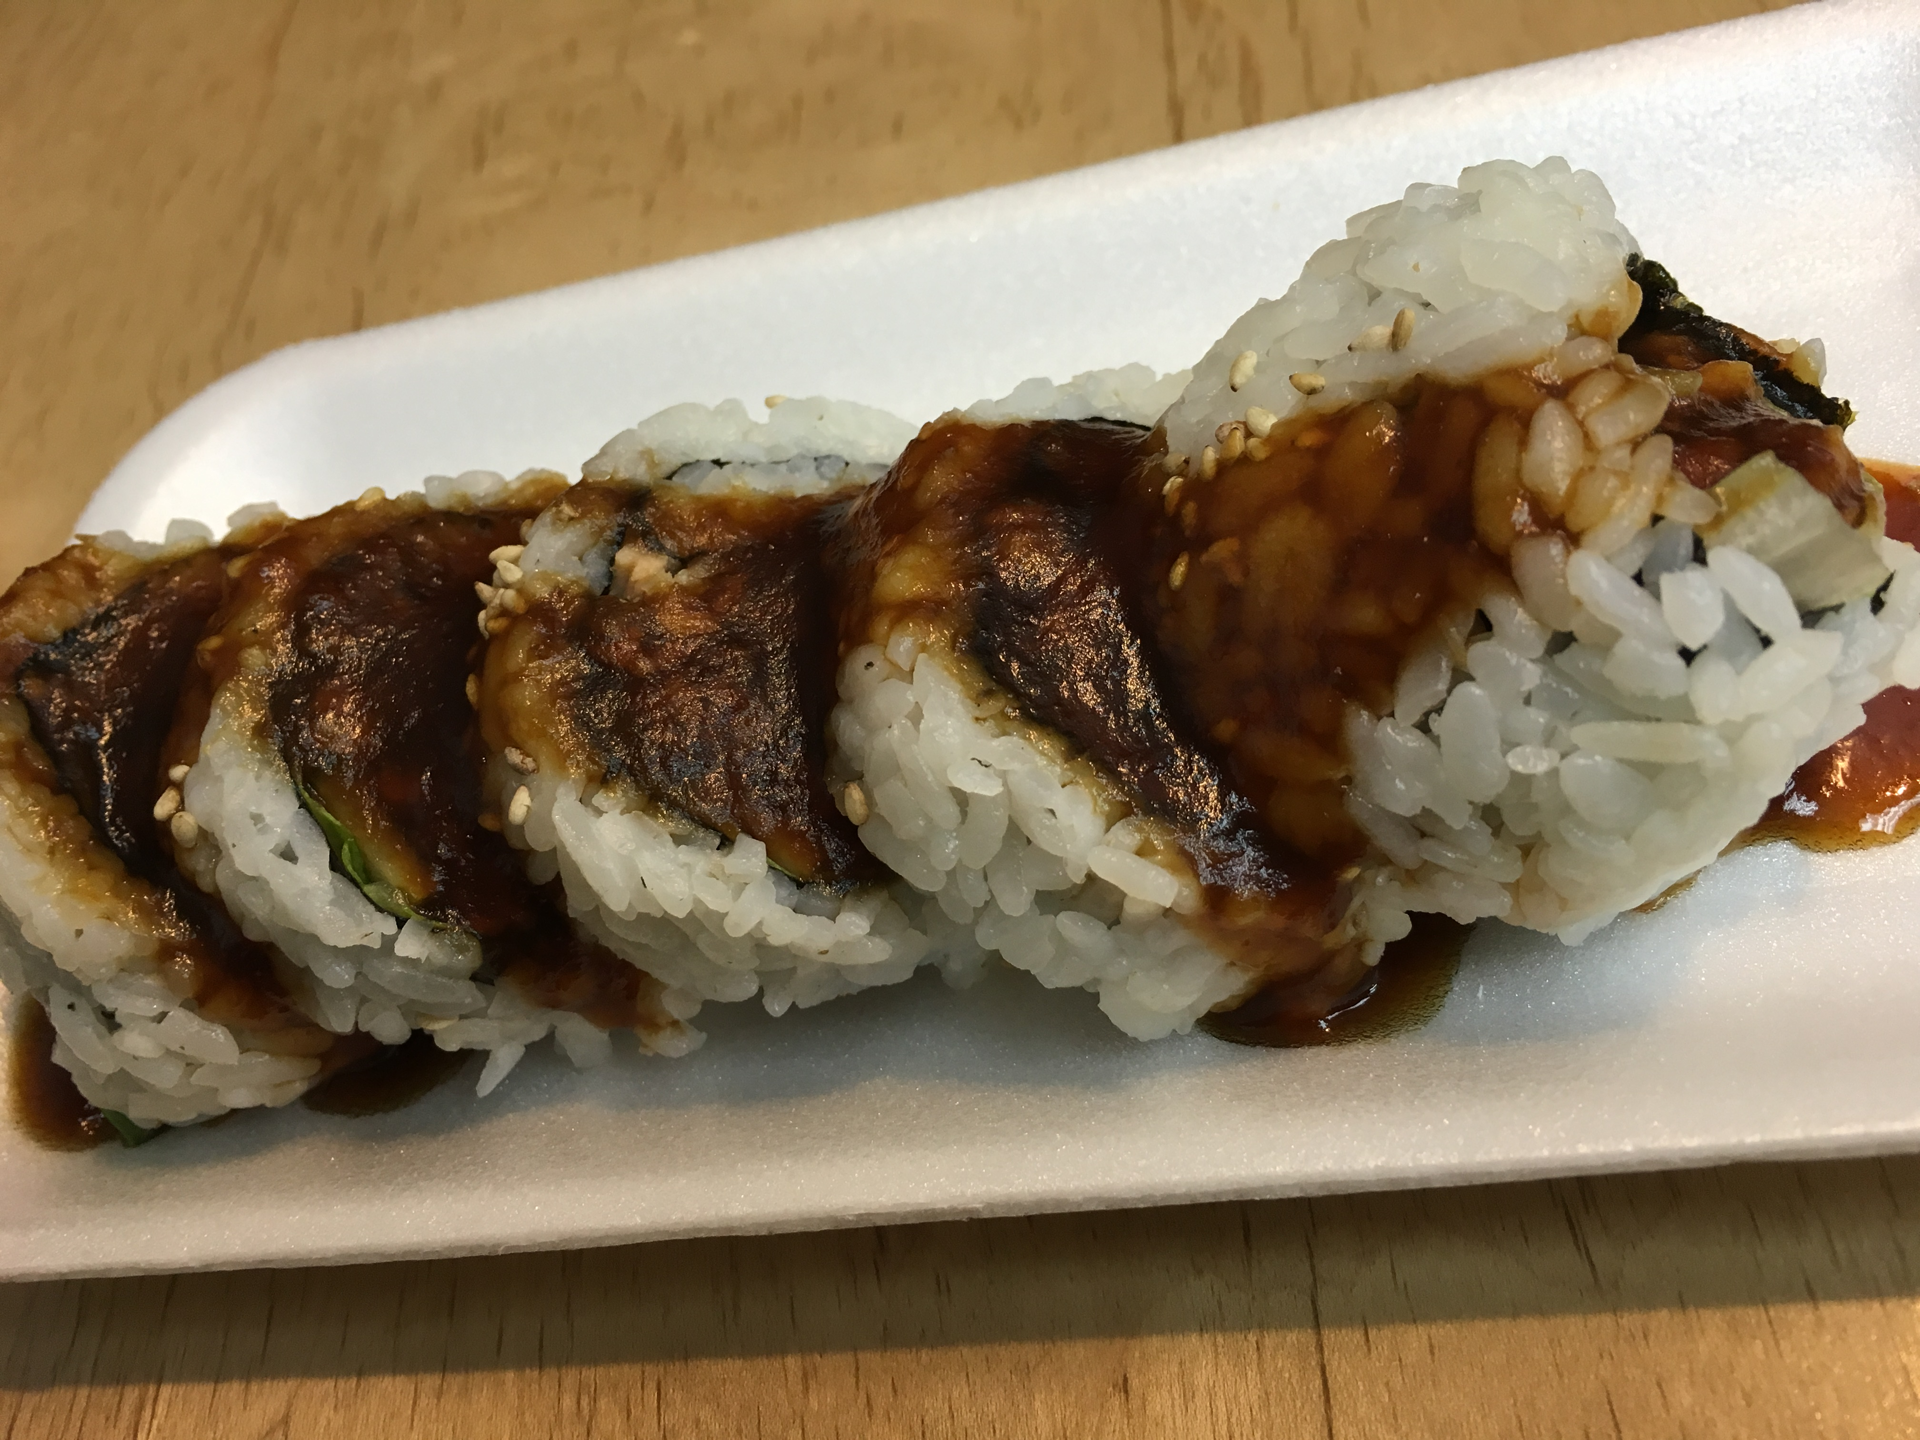 The BC Roll at Sashimi Sushi